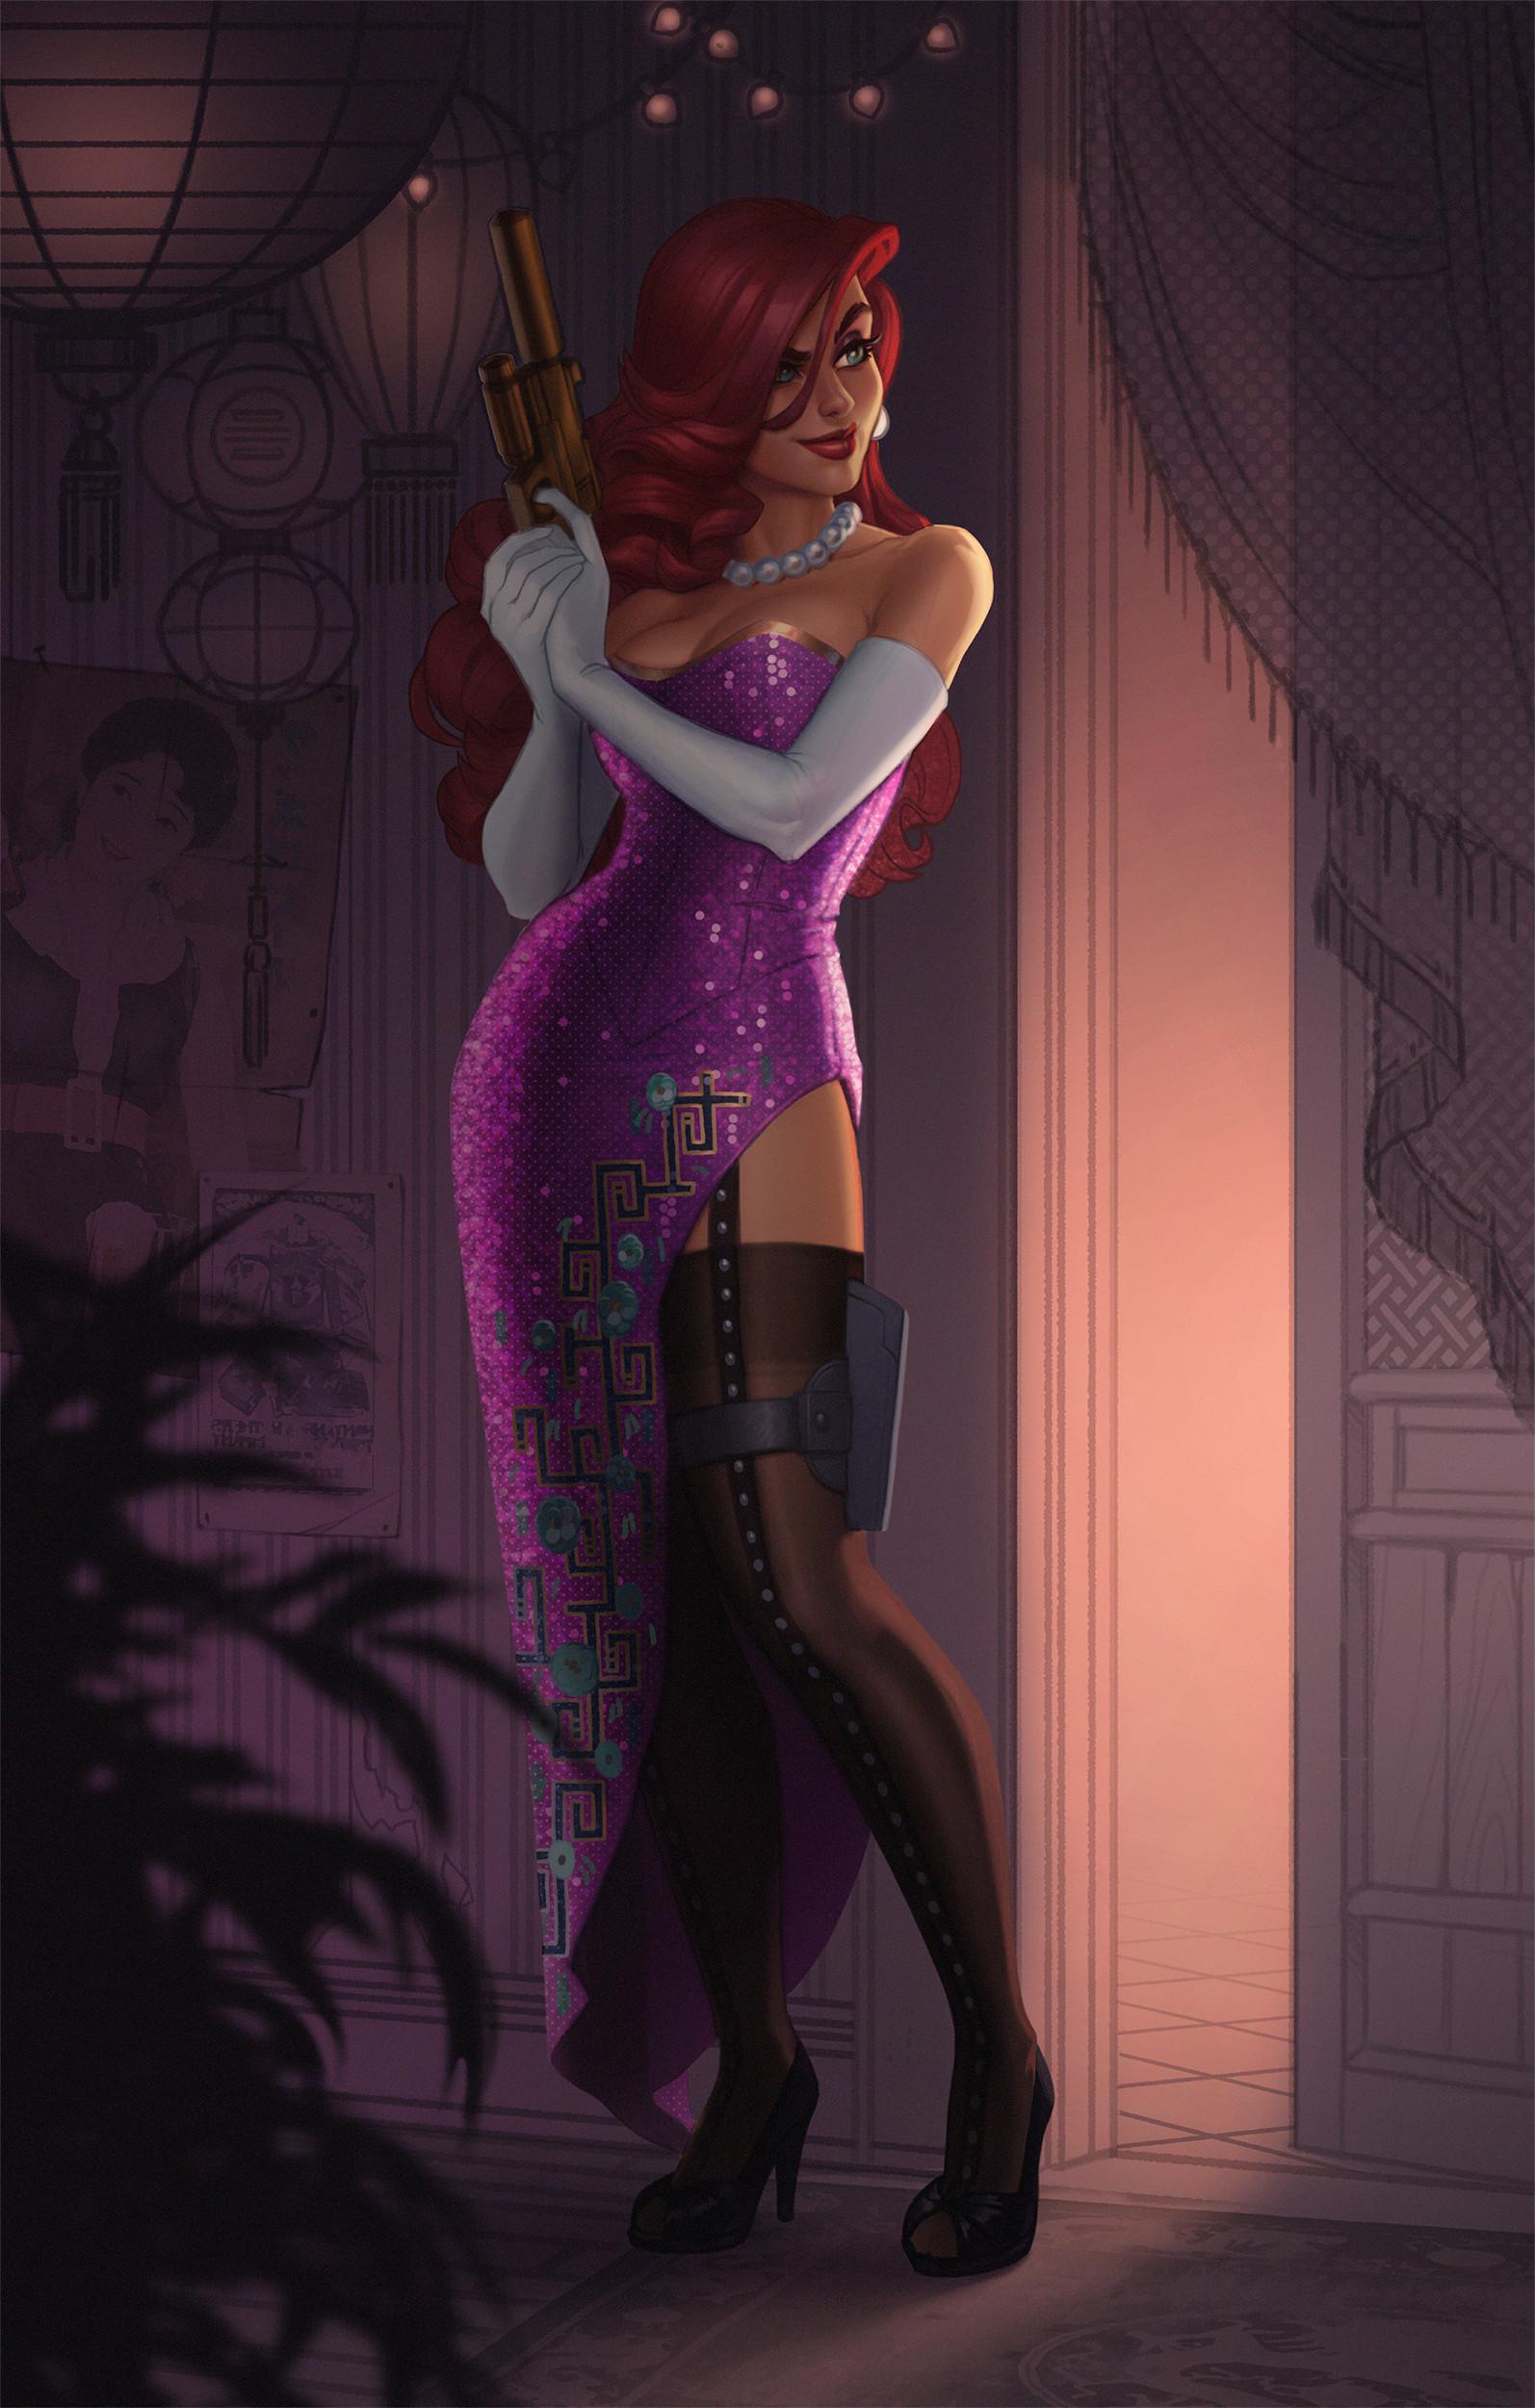 Artstation - Secret Agent Miss Fortune, Jessica Oyhenart-5024